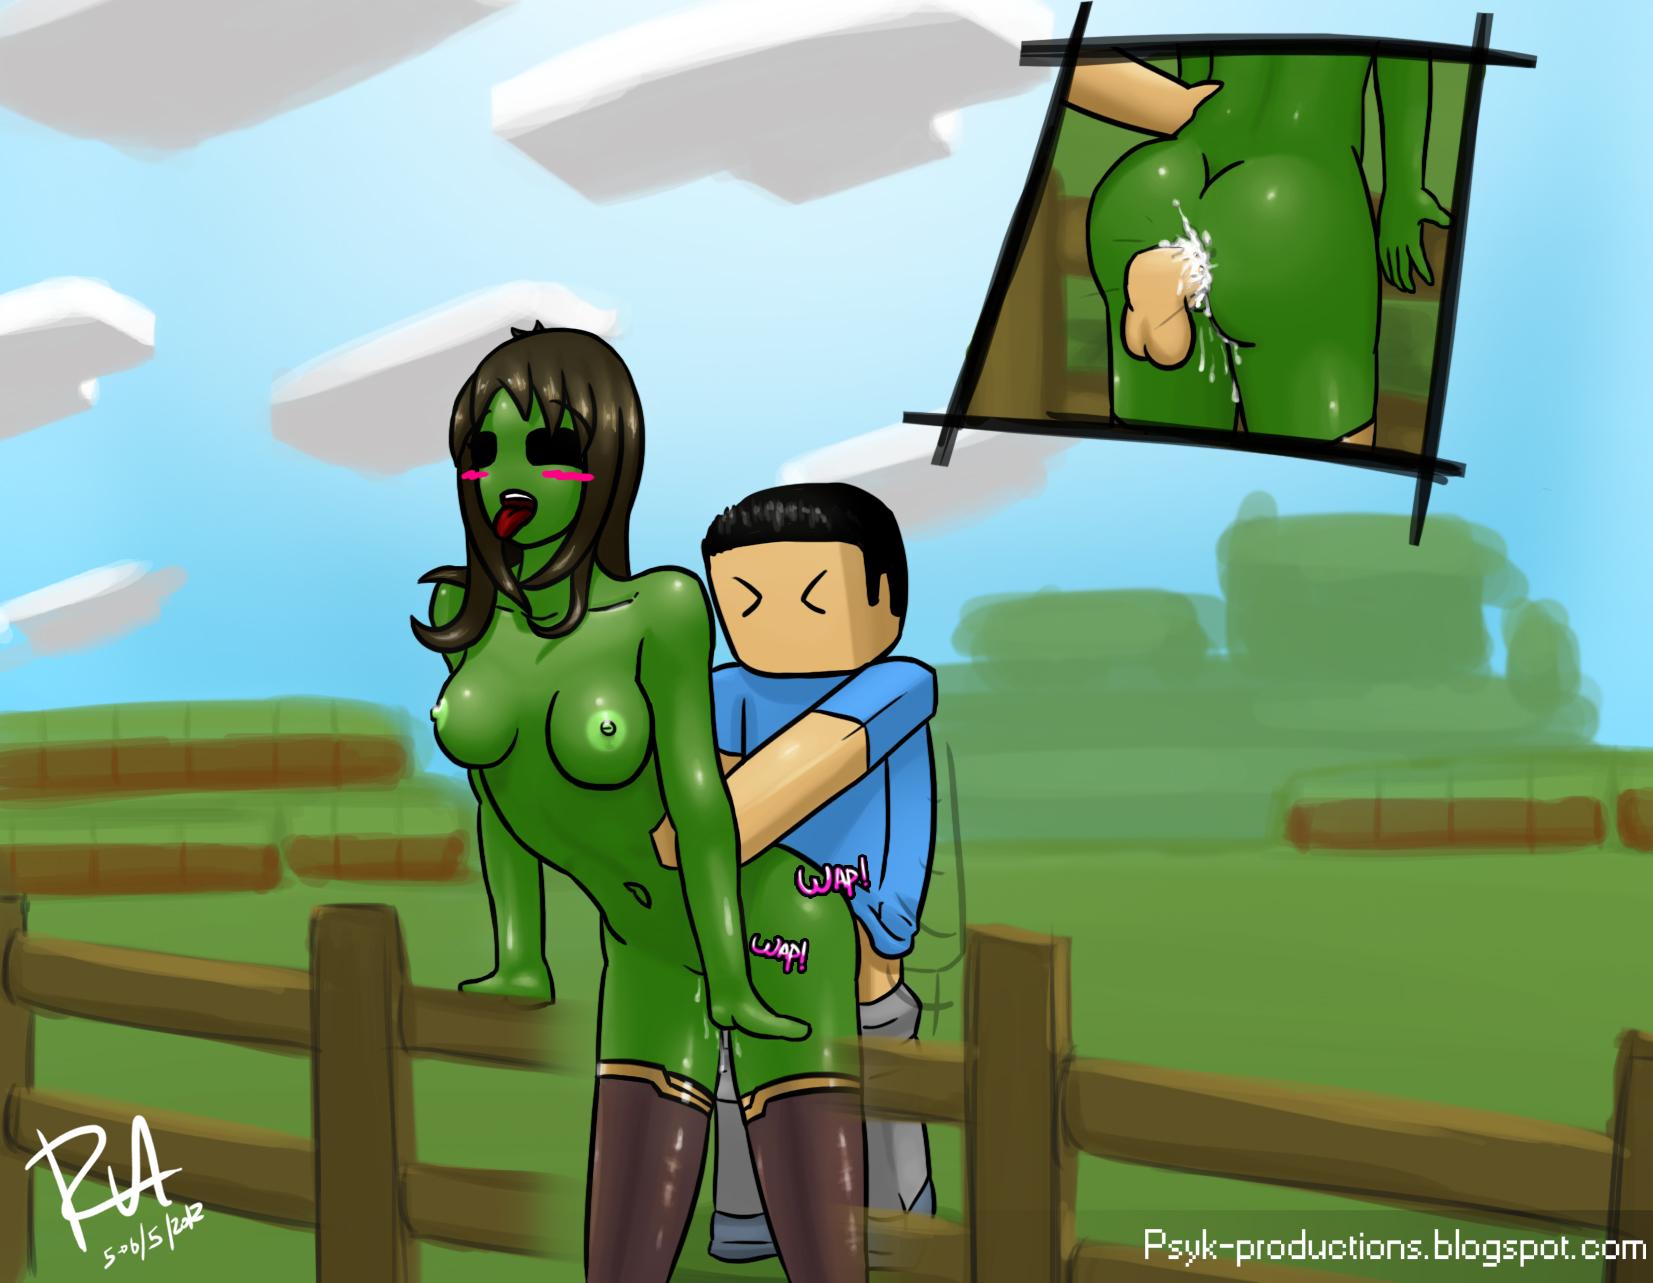 Mod girl sex minecraft nackt image